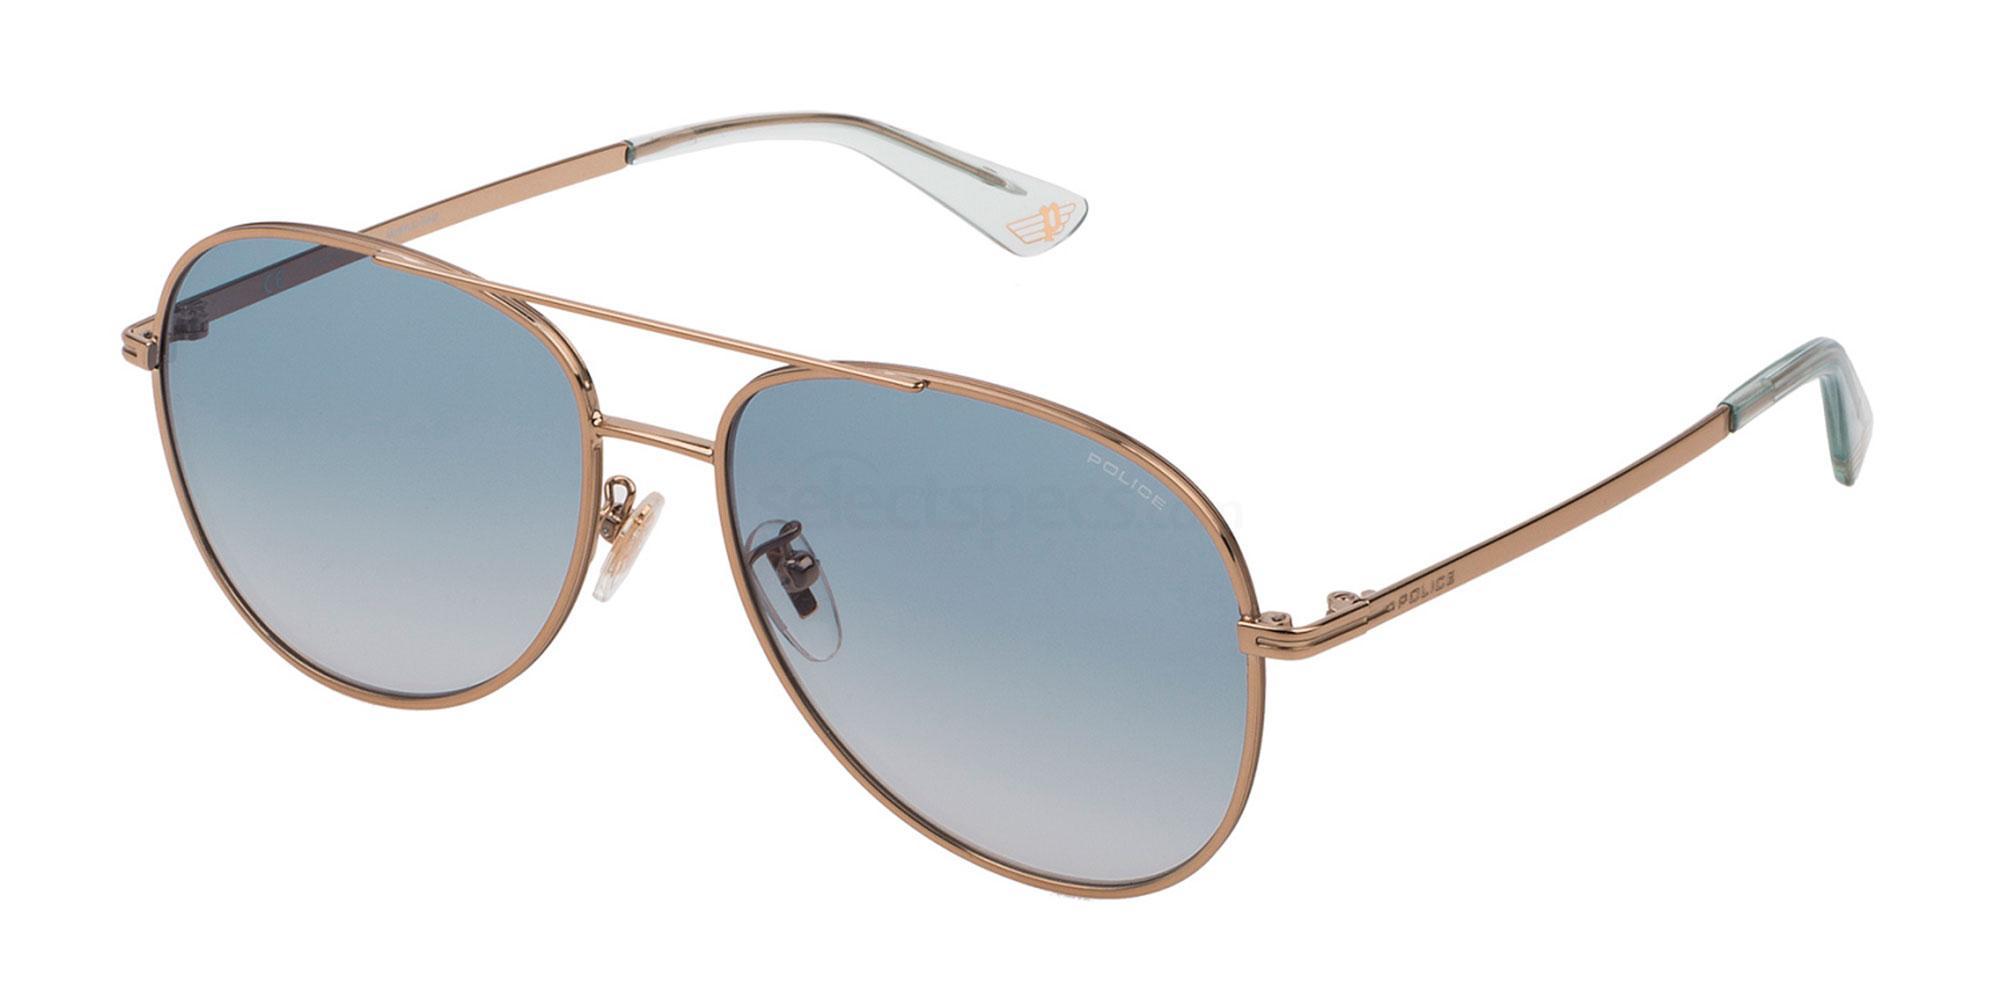 08L7 SPL777N Sunglasses, Police